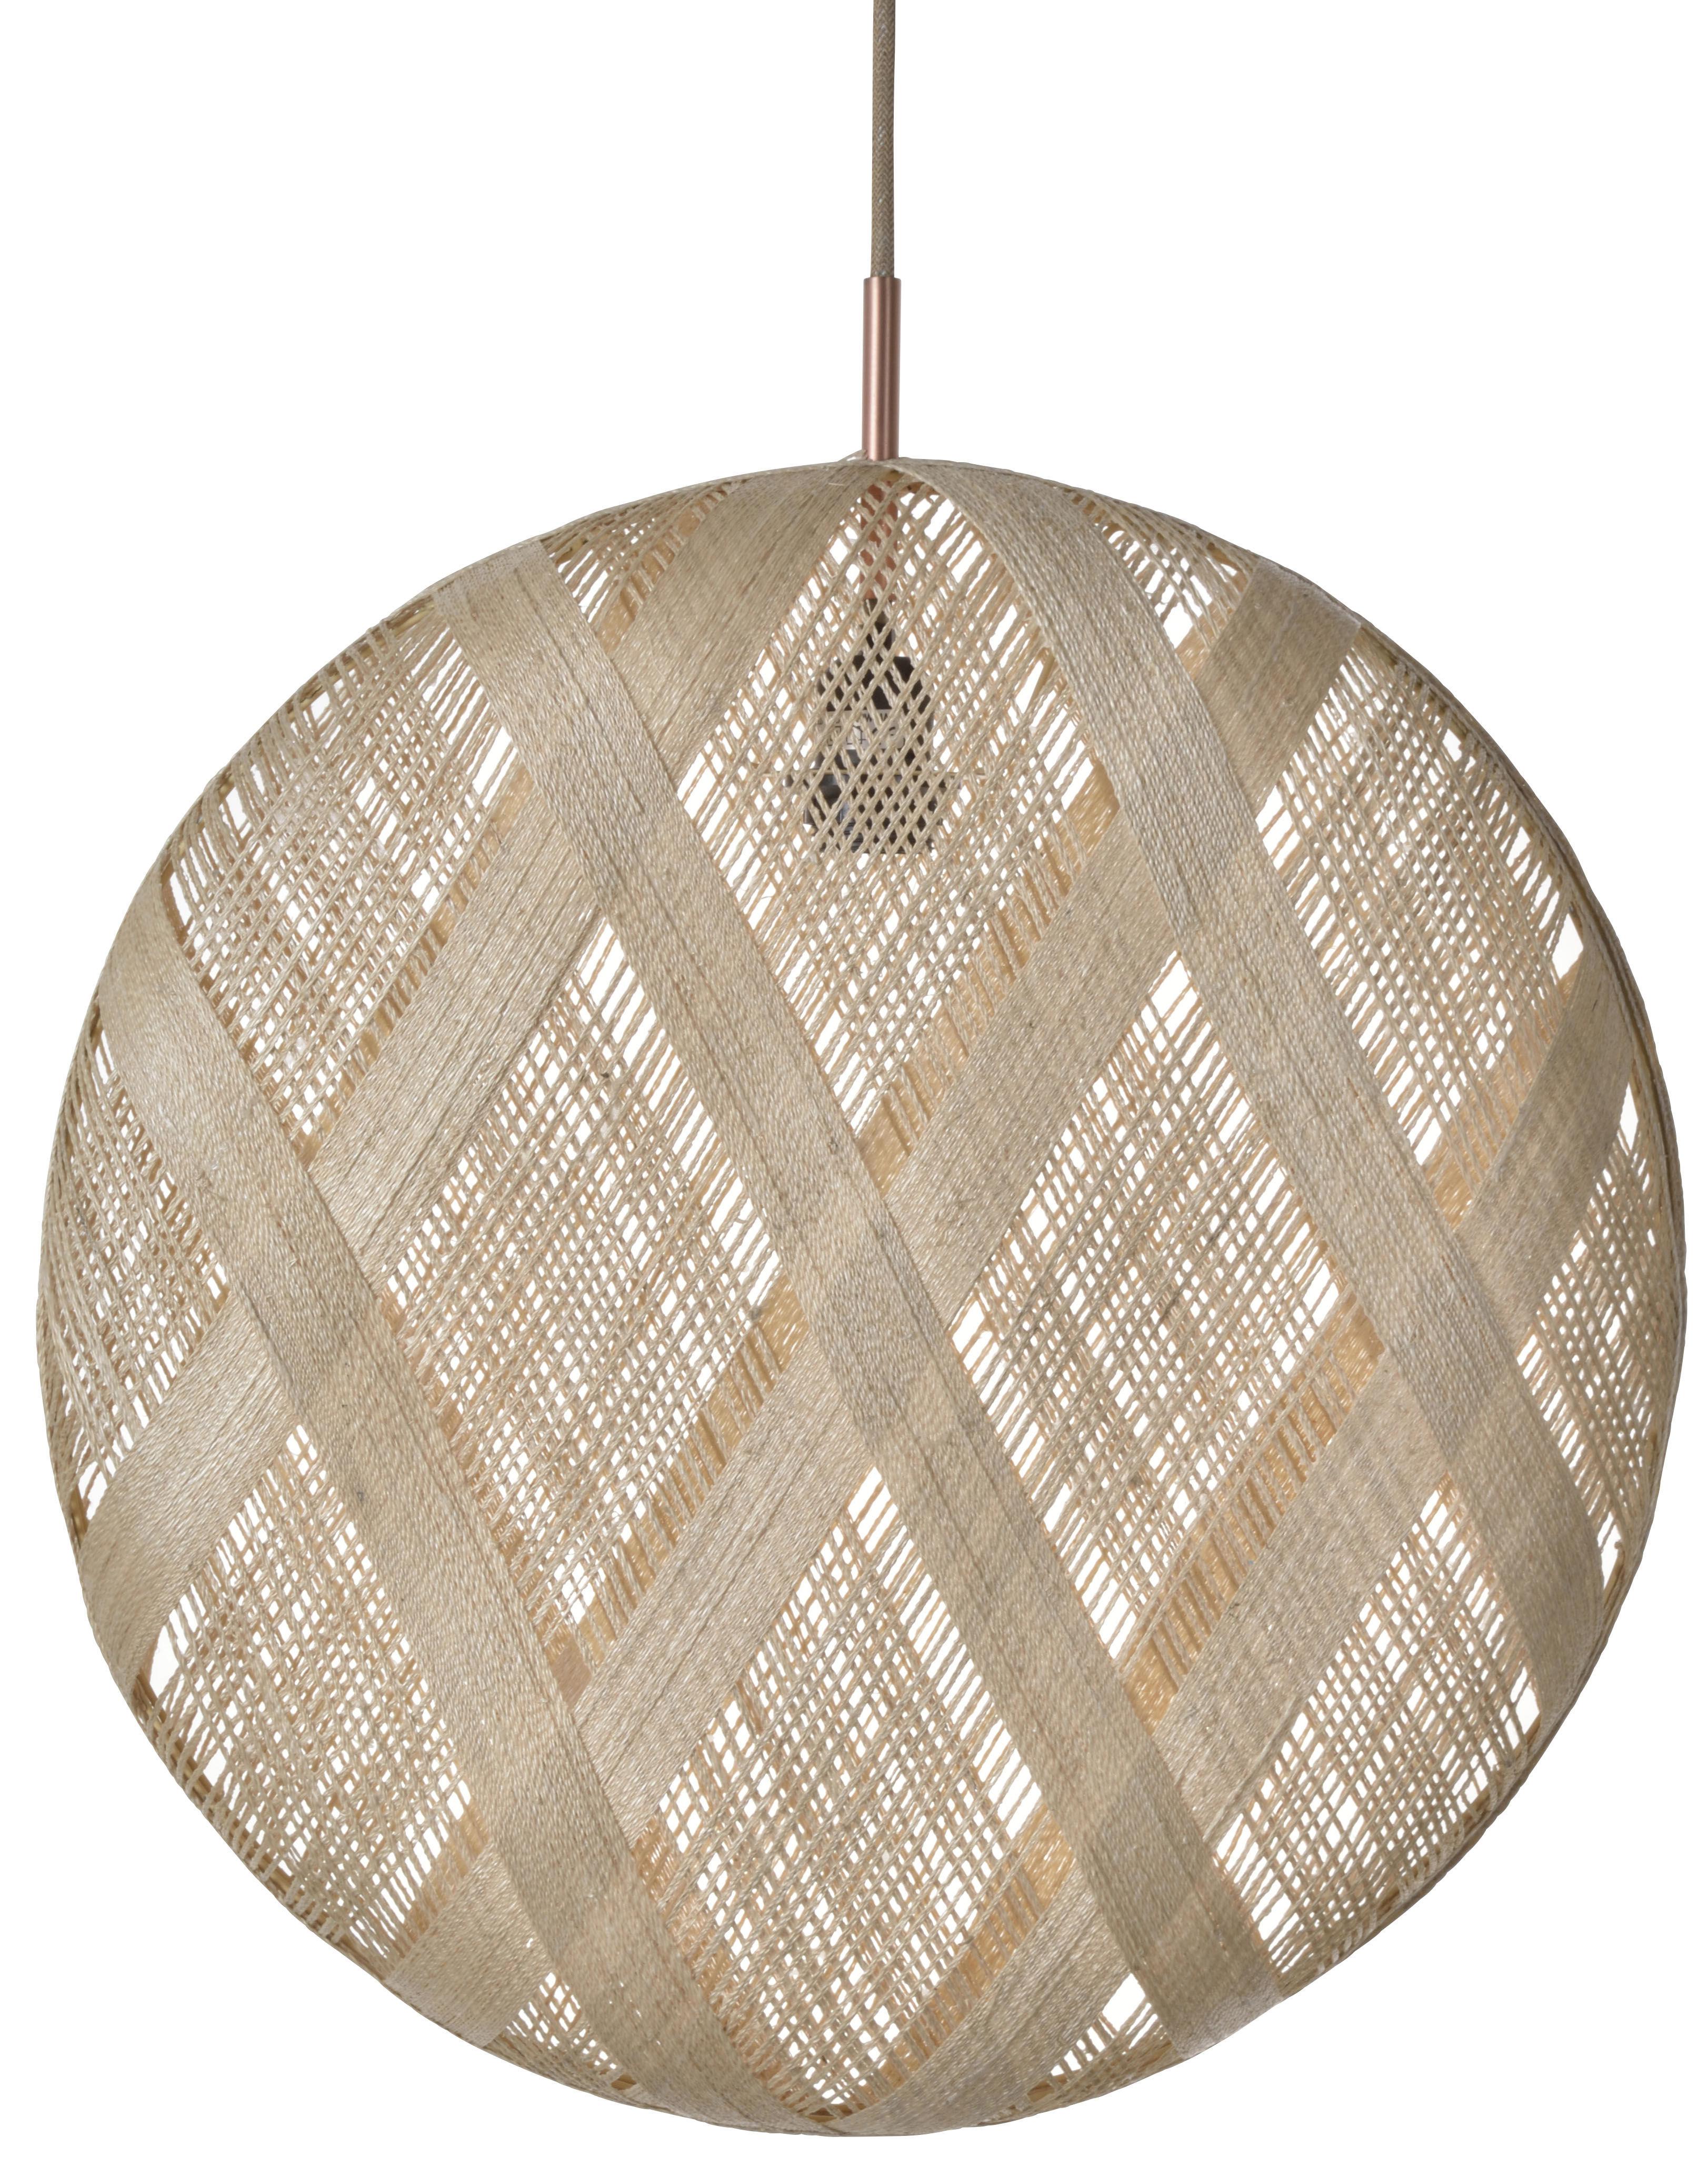 Lighting - Pendant Lighting - Chanpen Diamond Pendant - Ø 52 cm by Forestier - Natural / Diamond patterns - Woven acaba